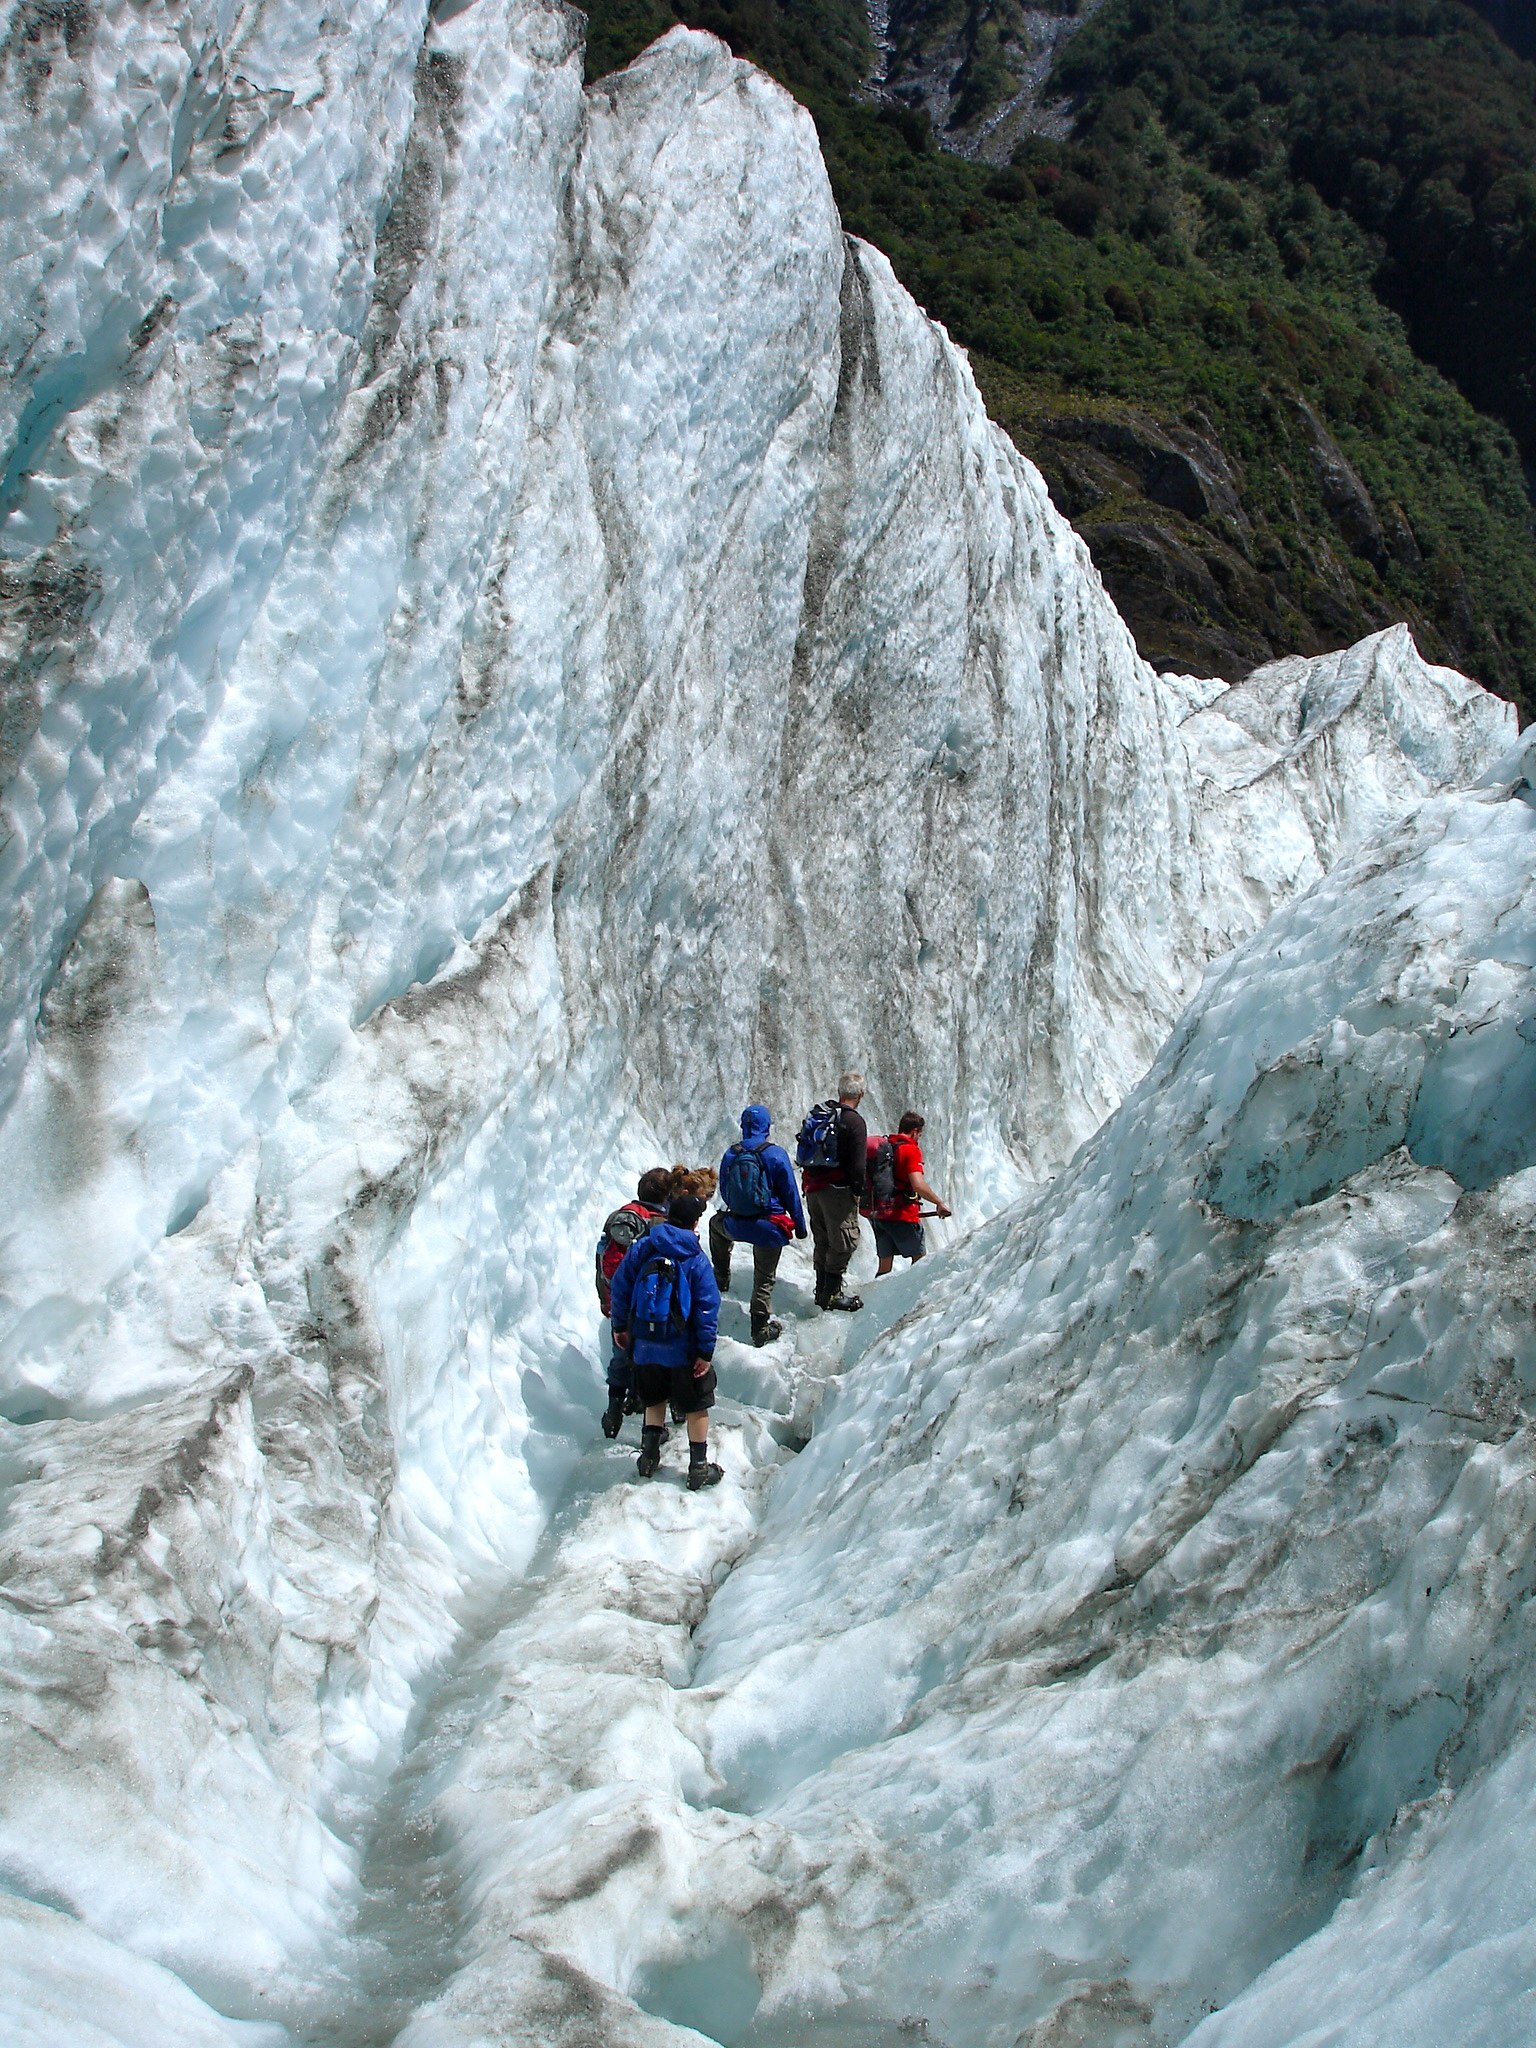 File:Franz Joseph Glacier Hike (3424235146) jpg - Wikimedia